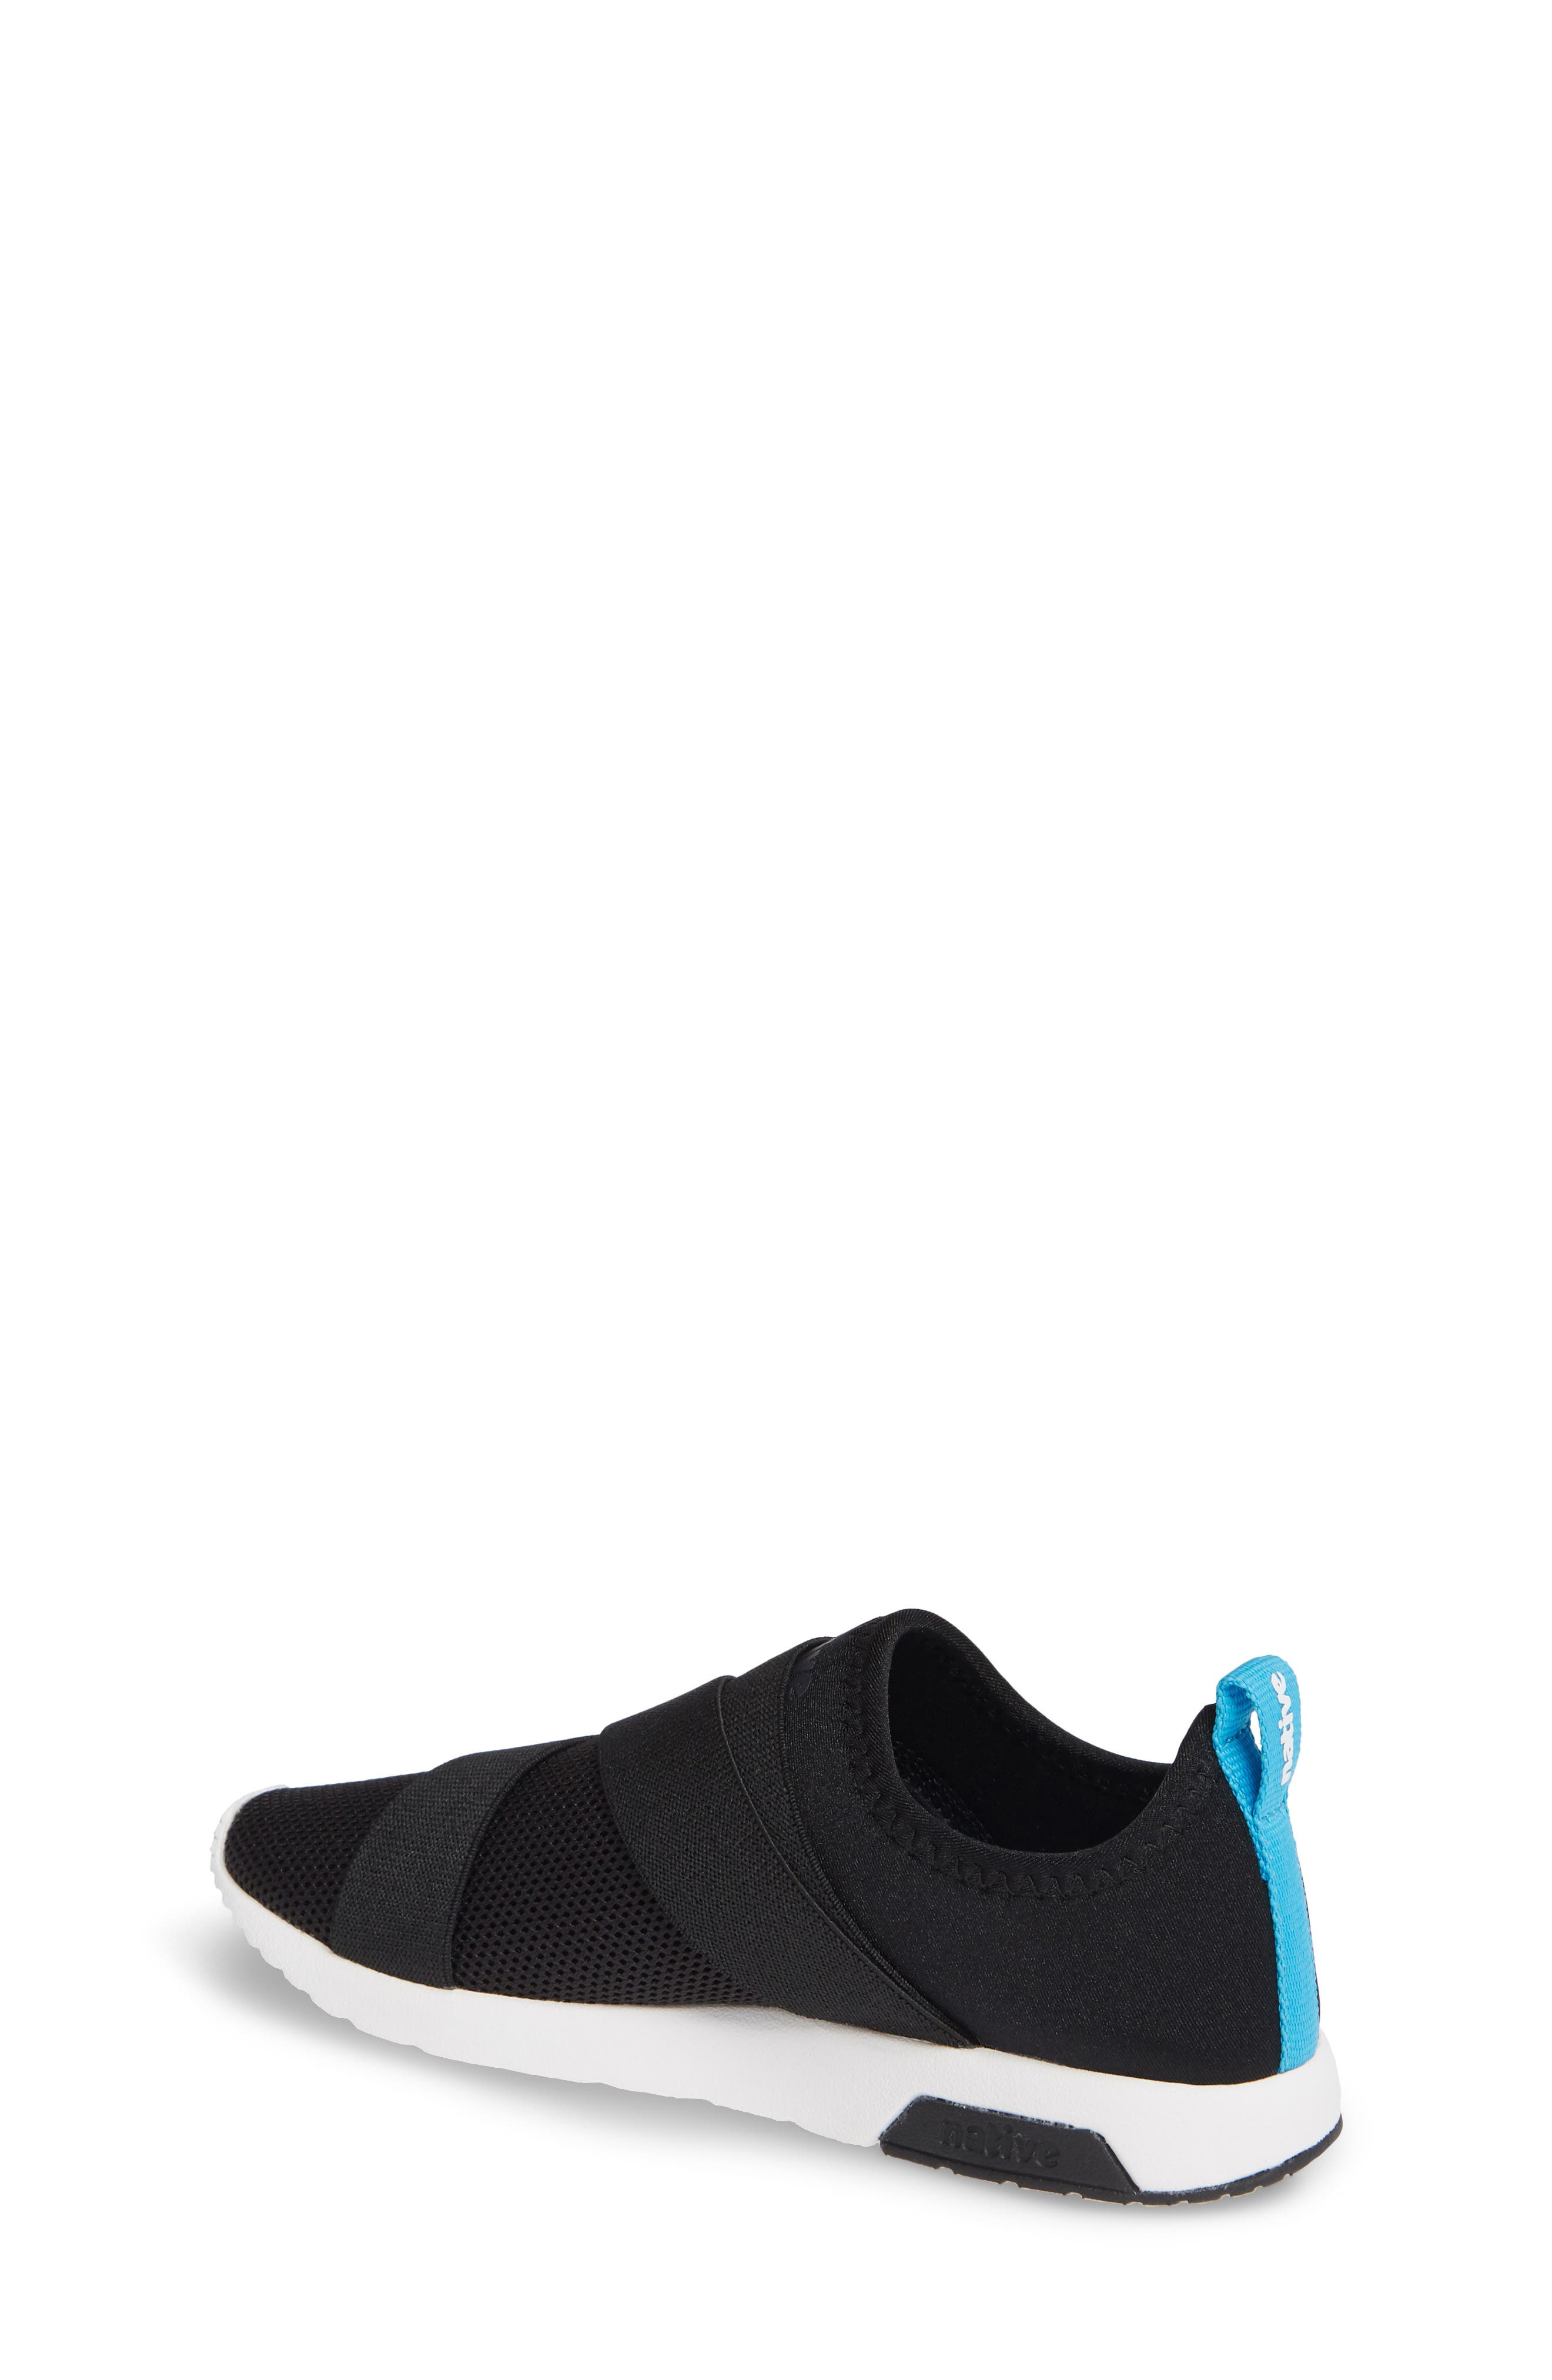 Phoenix Slip-On Sneaker,                             Alternate thumbnail 2, color,                             JIFFY BLACK/ SHELL WHITE